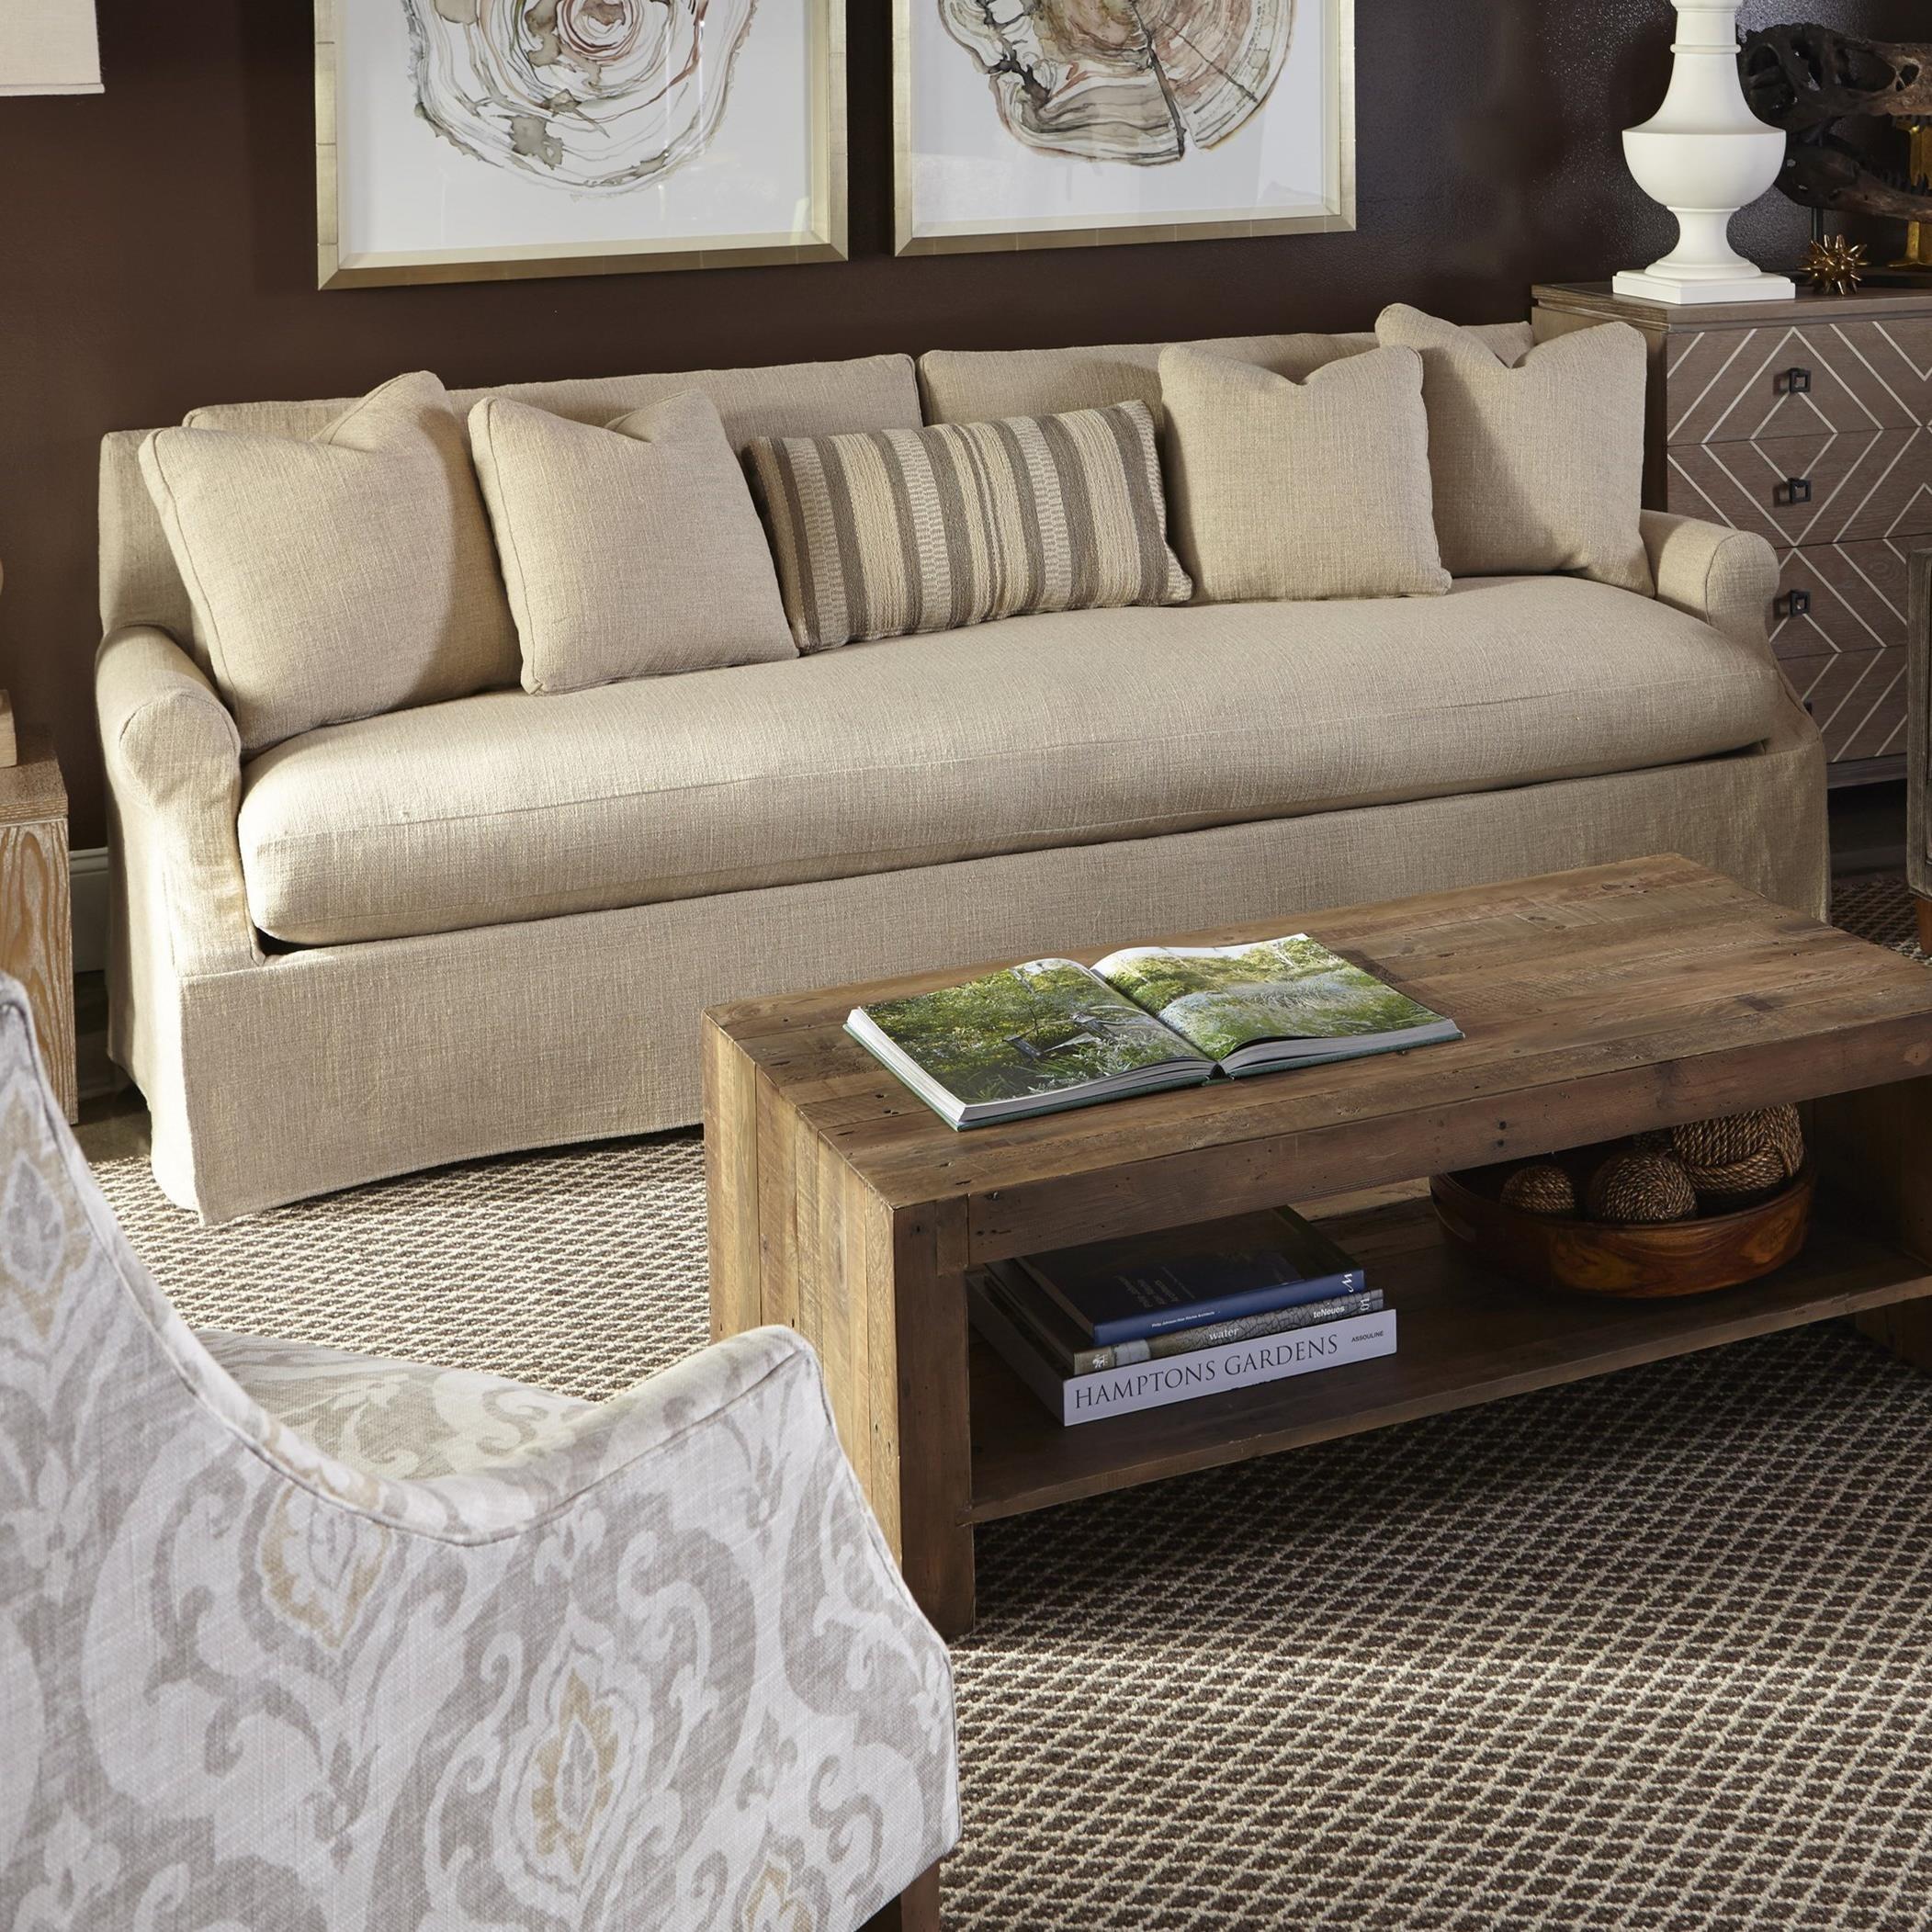 Wonderful Robin Bruce Bristol Contemporary Slipcovered Sofa With Bench Cushion